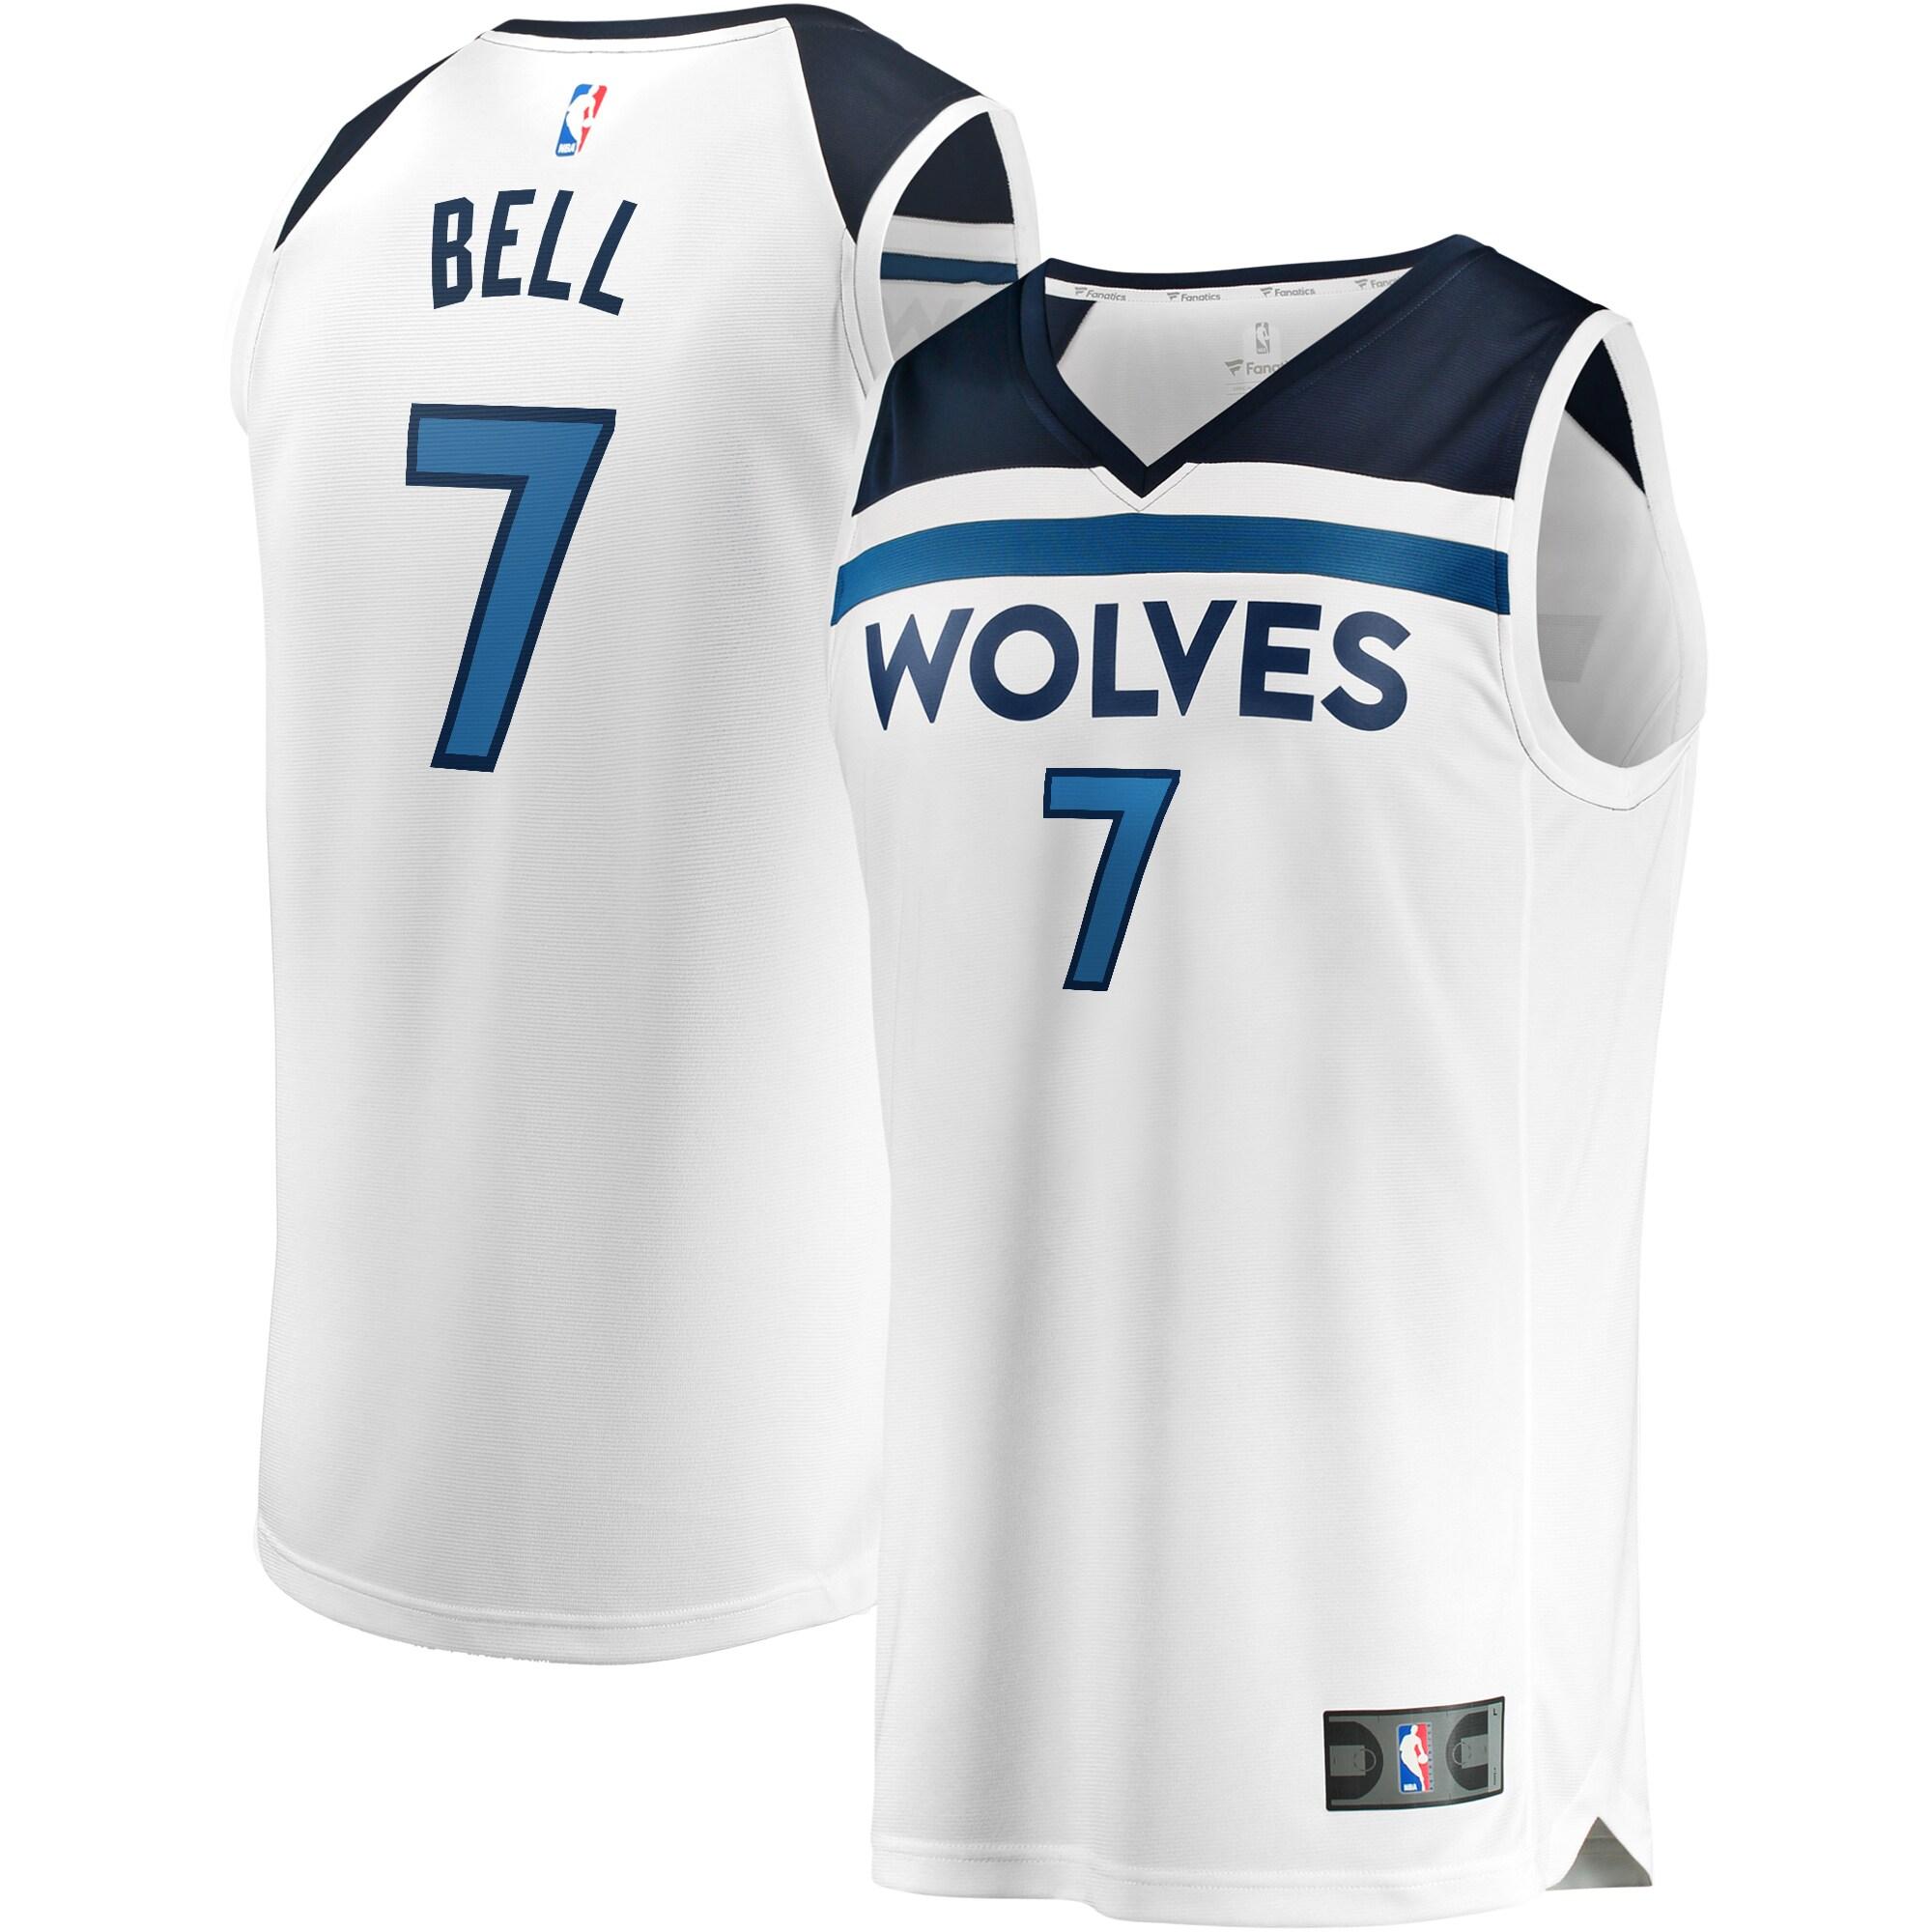 Jordan Bell Minnesota Timberwolves Fanatics Branded Fast Break Replica Player Jersey White - Association Edition